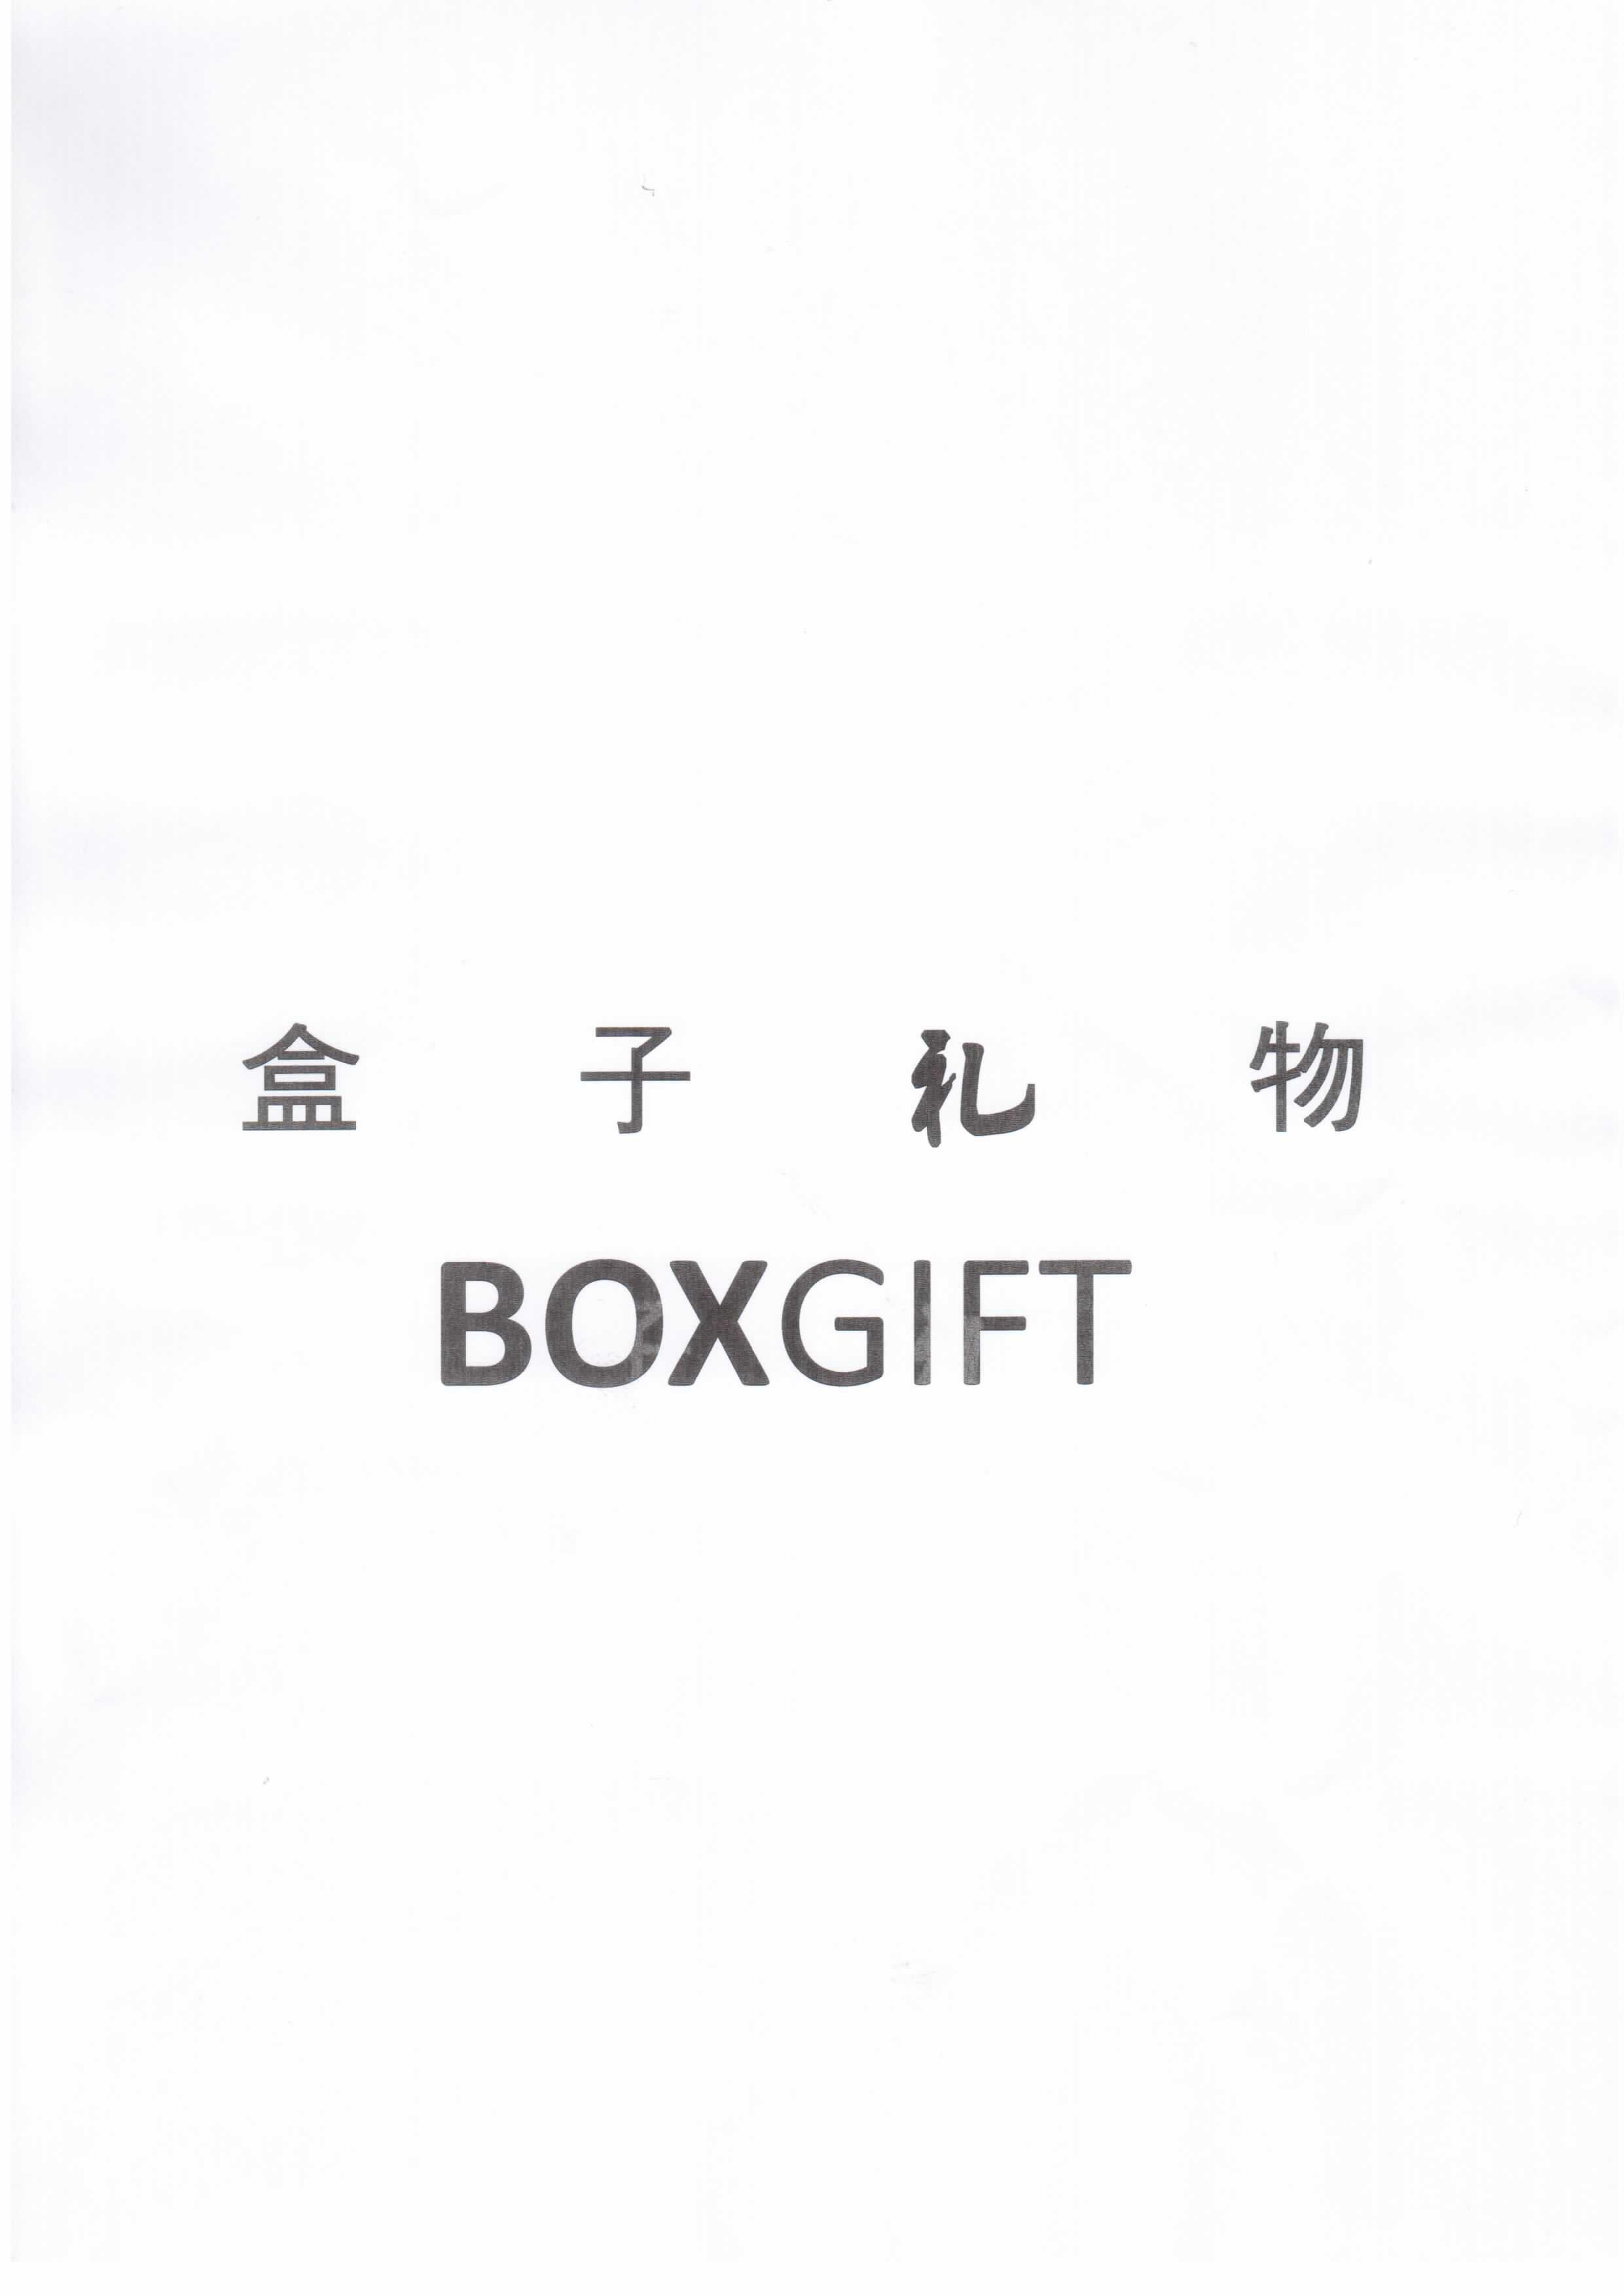 盒子礼物  BOXGIFT